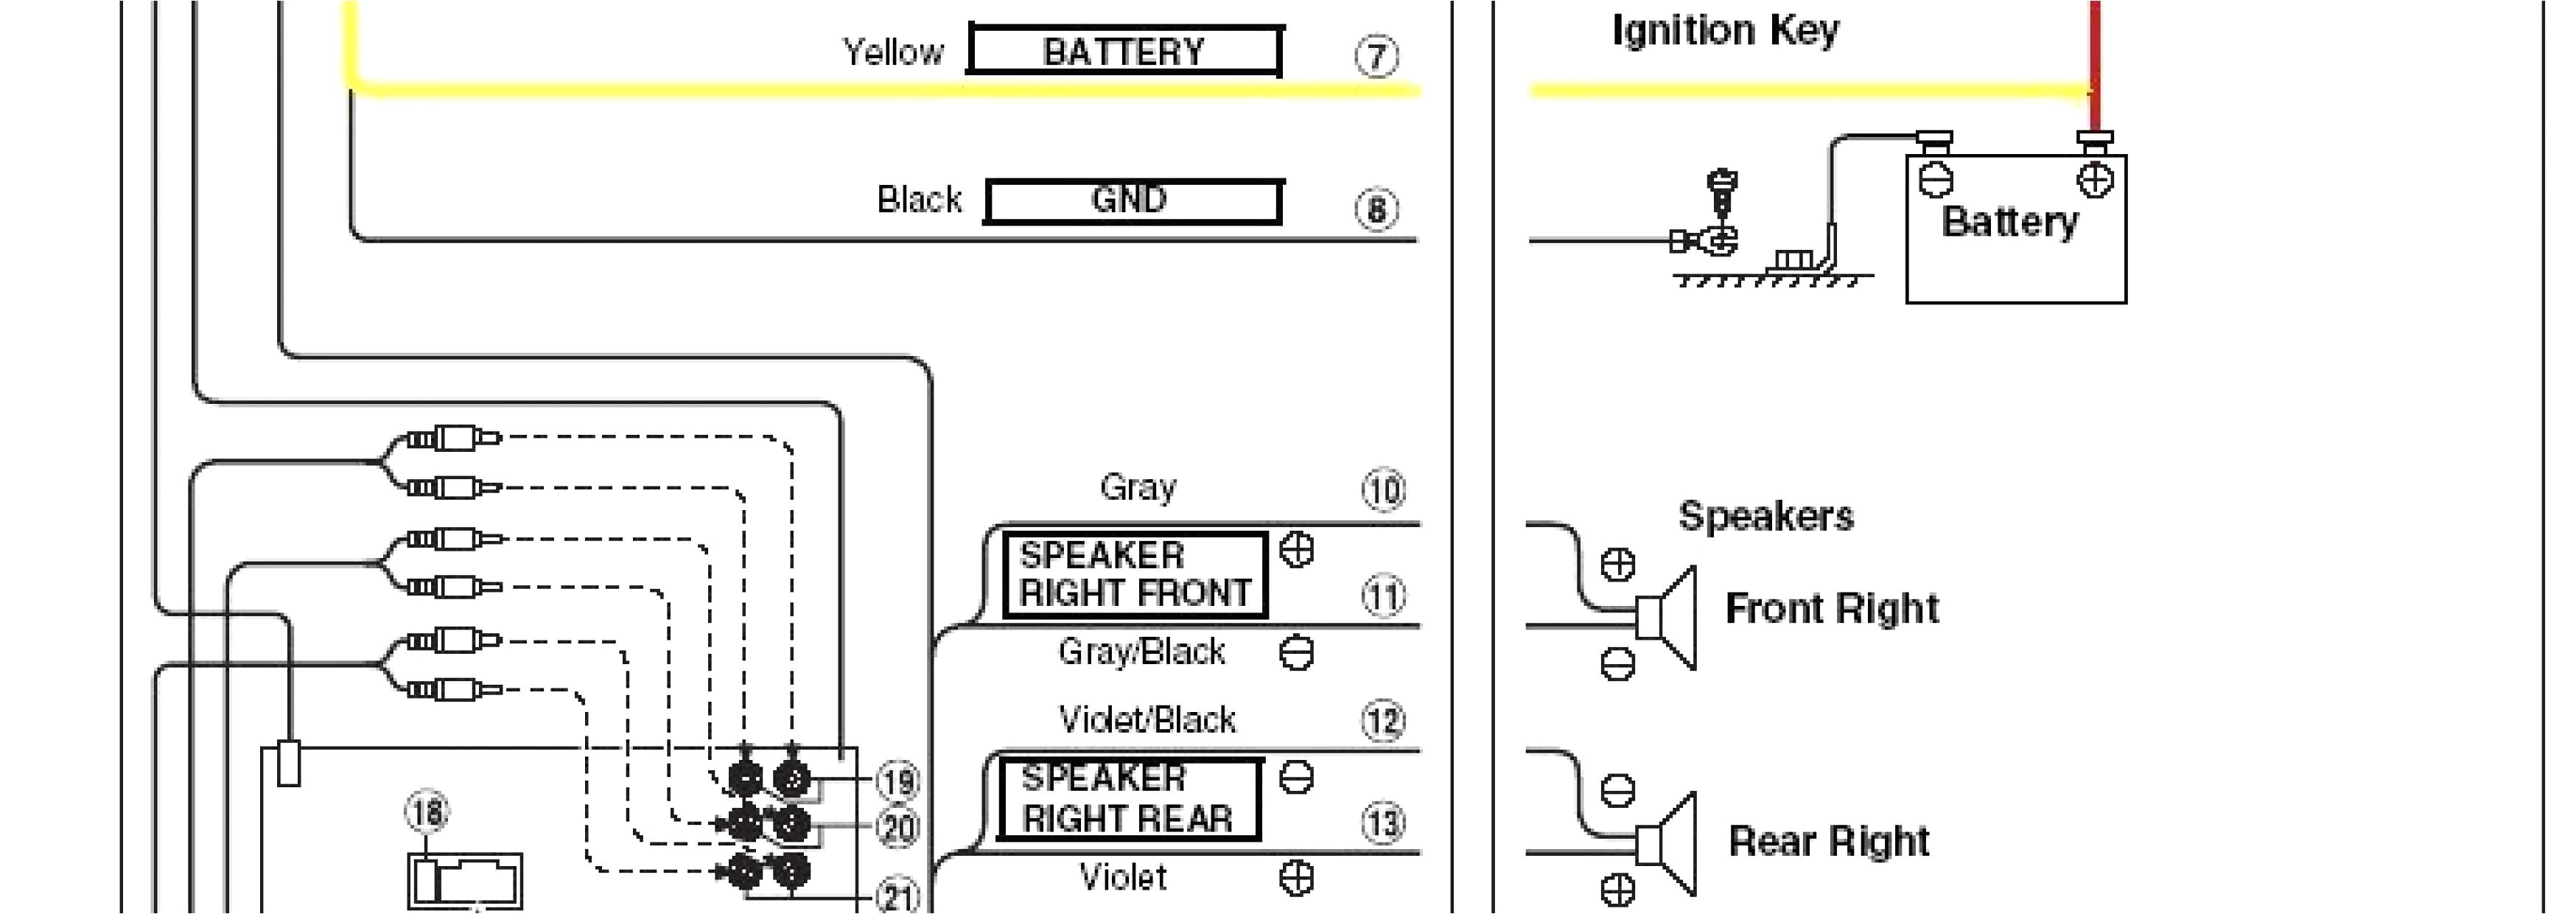 pioneer avic d1 wiring diagram wiring diagram standard pioneer avic d3 wiring harness diagram wiring diagram